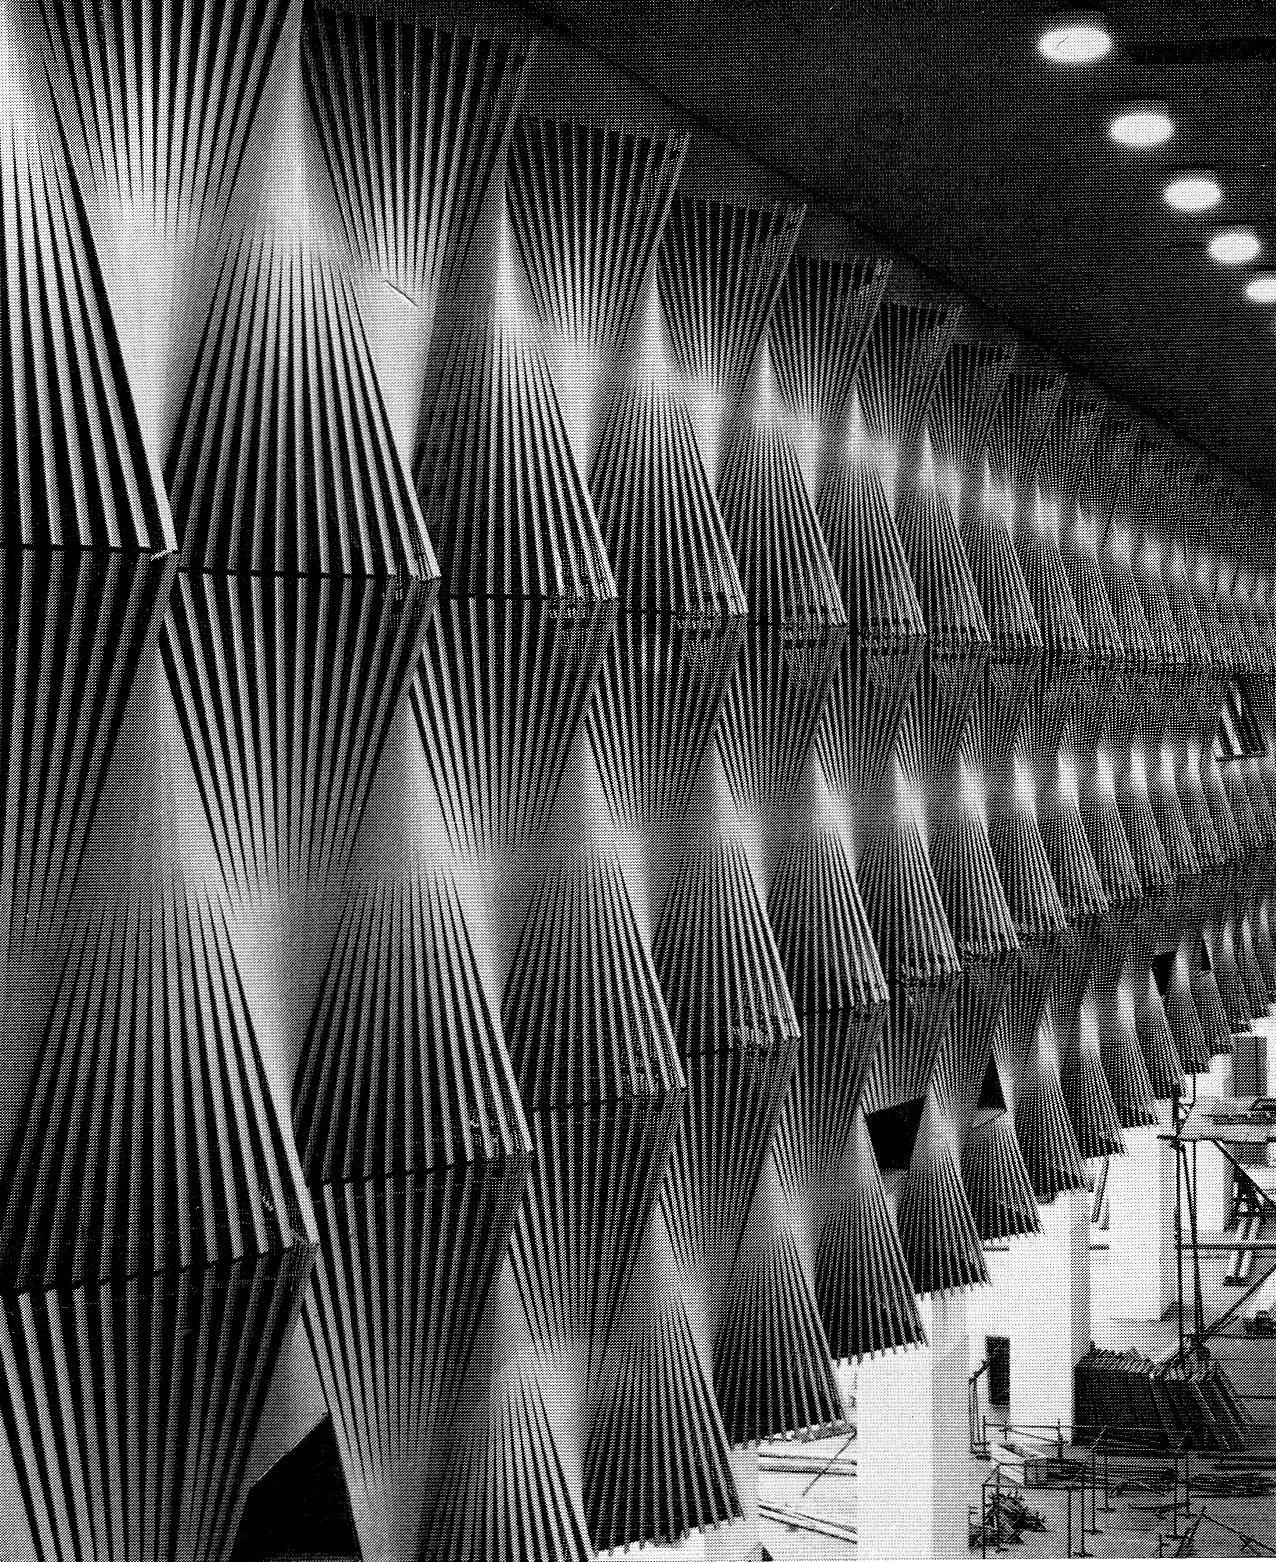 k freyer fan shaped acoustic wall panels at a congress on acoustic wall panels id=63809